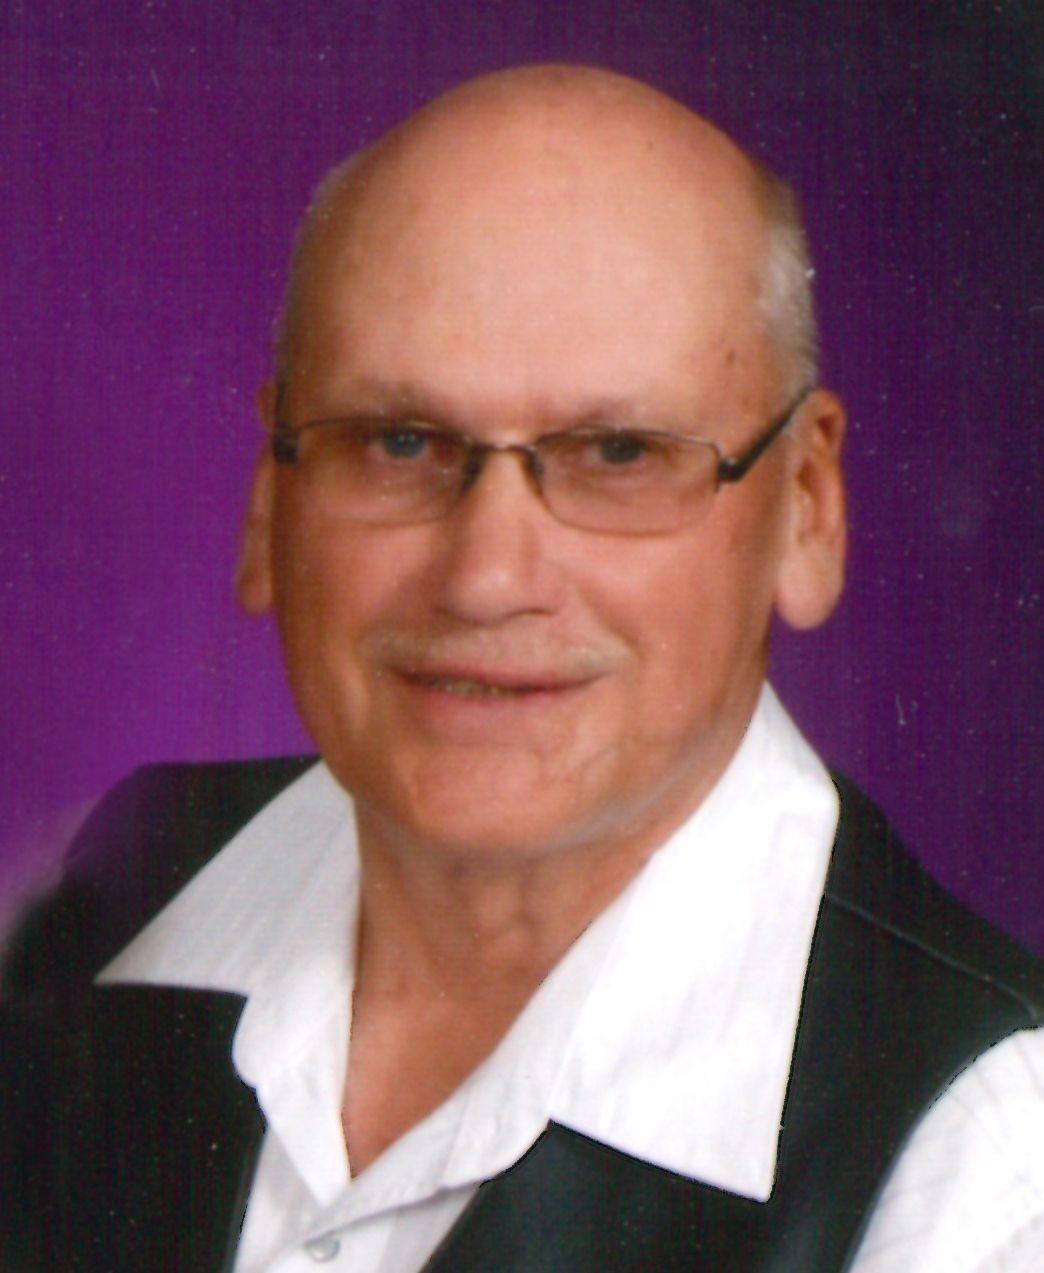 Kenneth Leroy Vander Plas